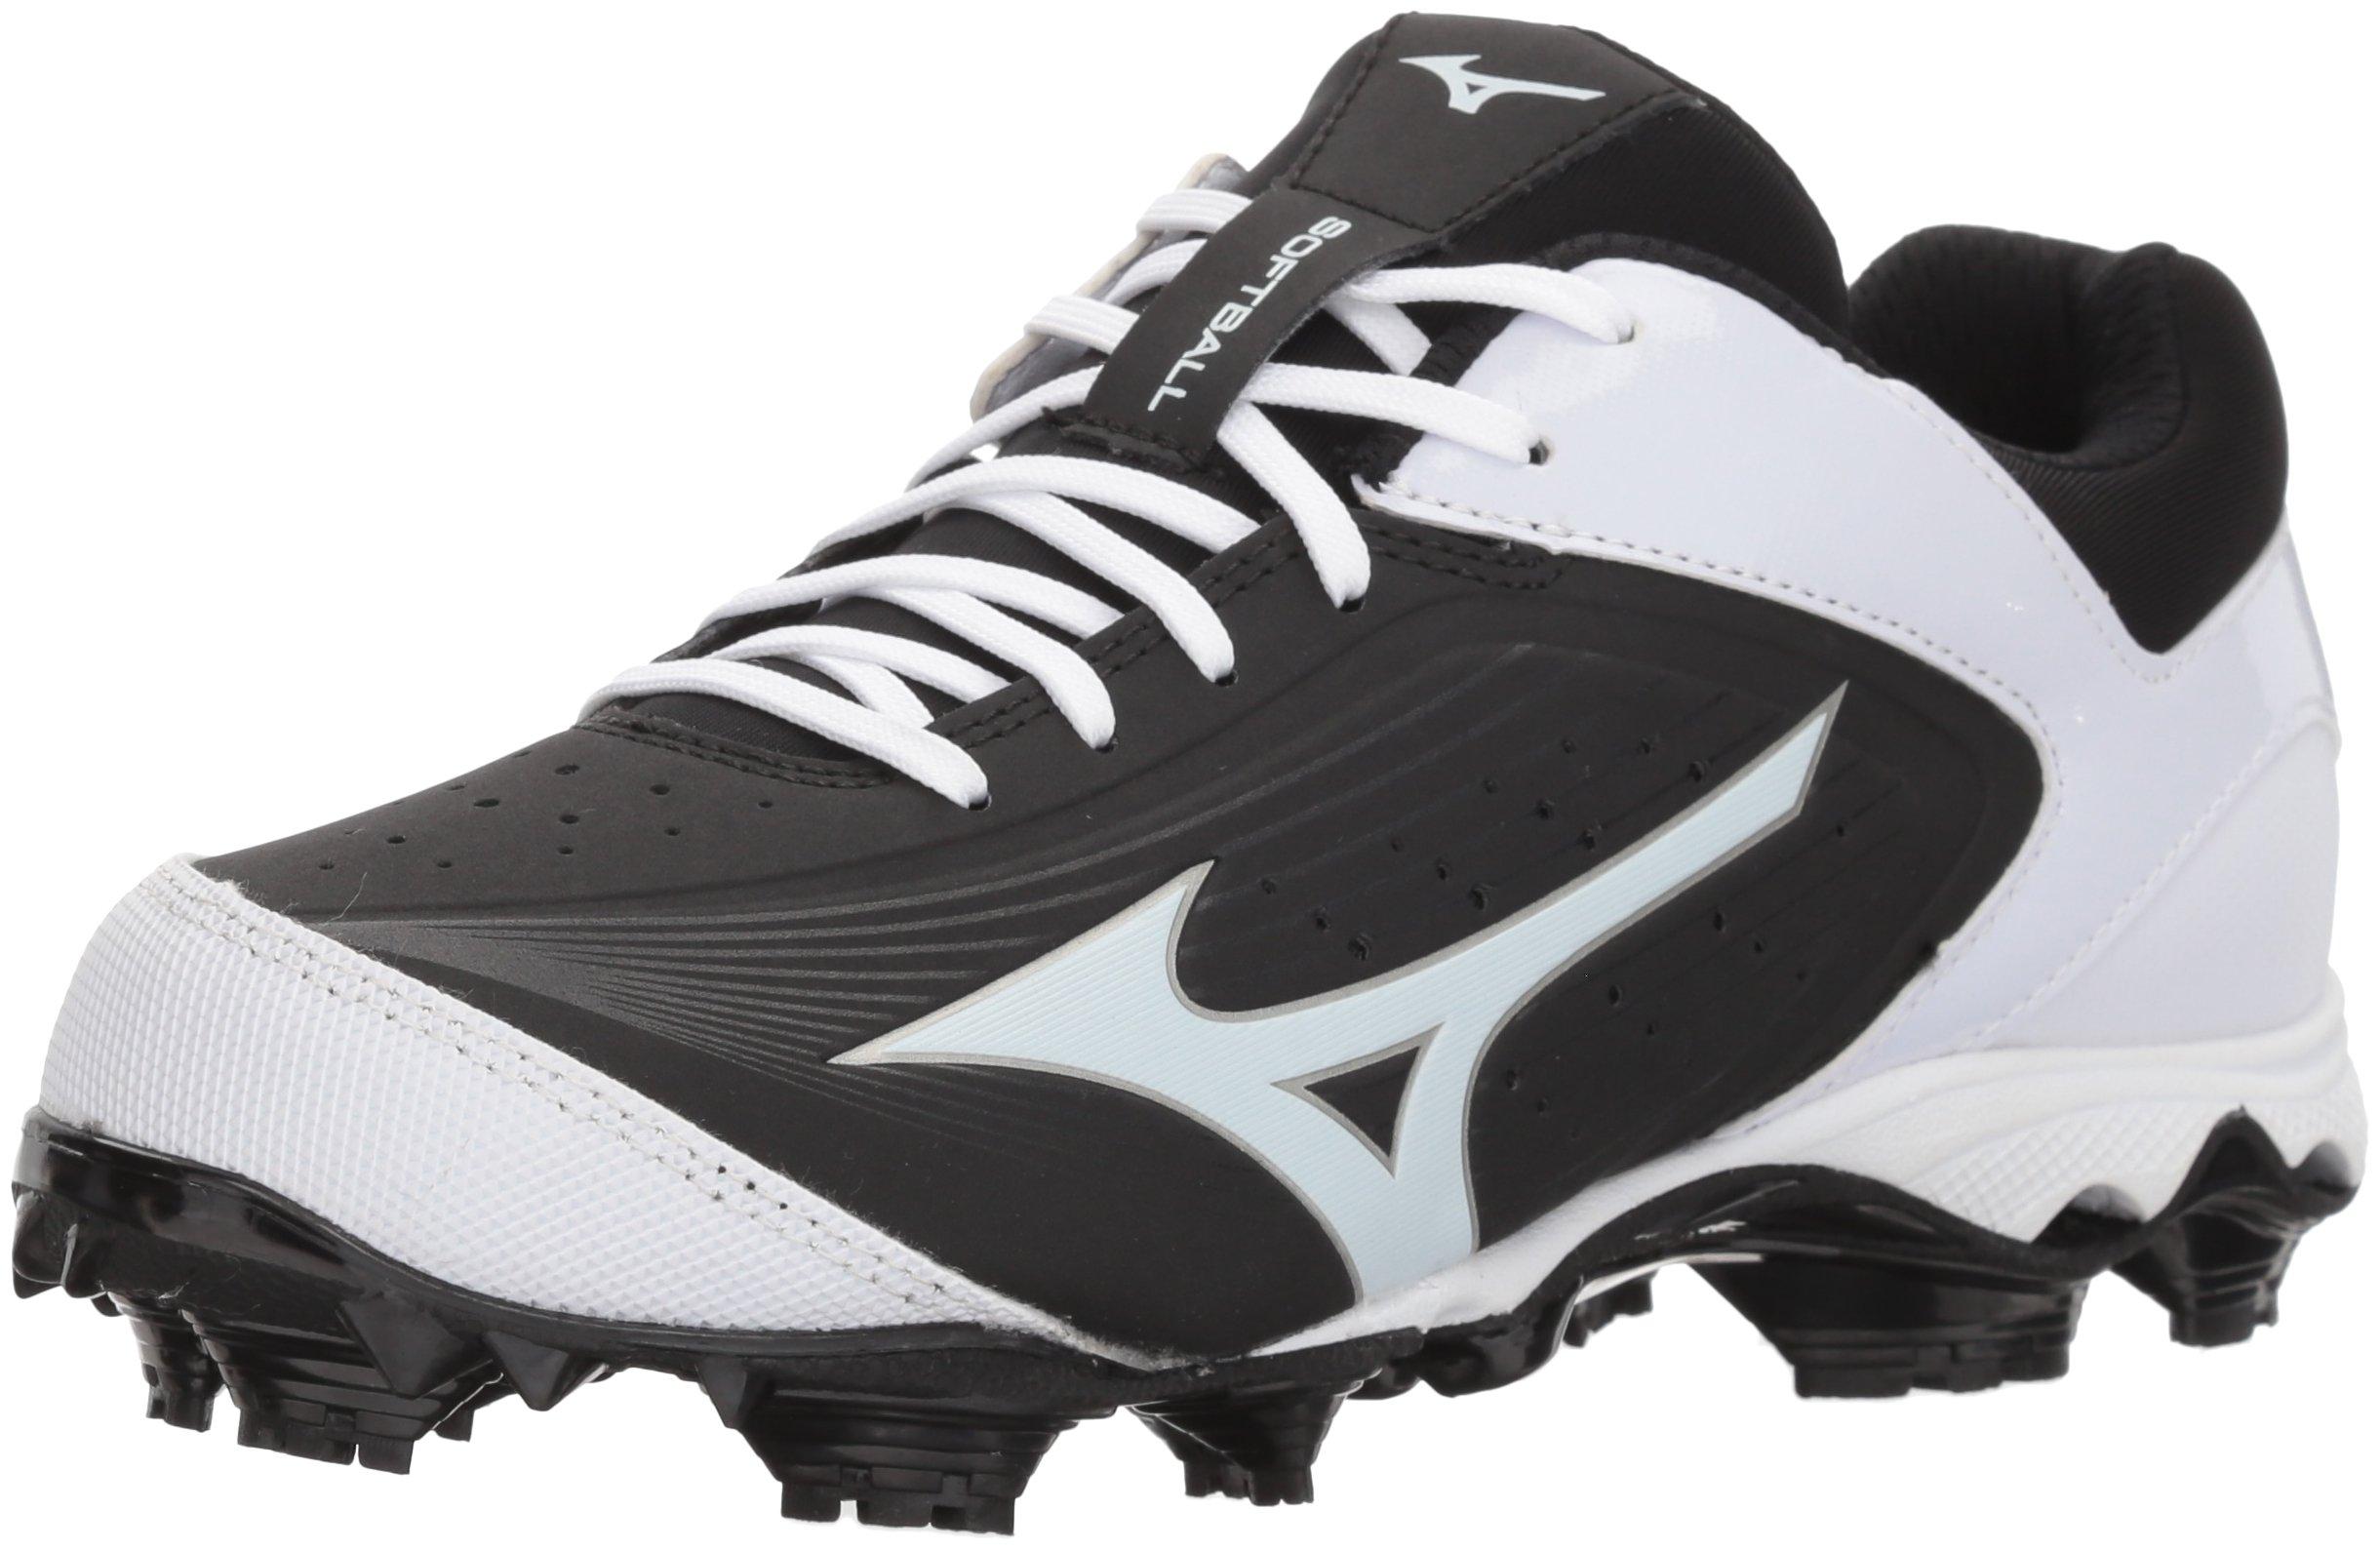 Mizuno Women's 9-Spike Advanced Finch Elite 3 Fastpitch Cleat Softball Shoe, Black/White, 9.5 B US by Mizuno